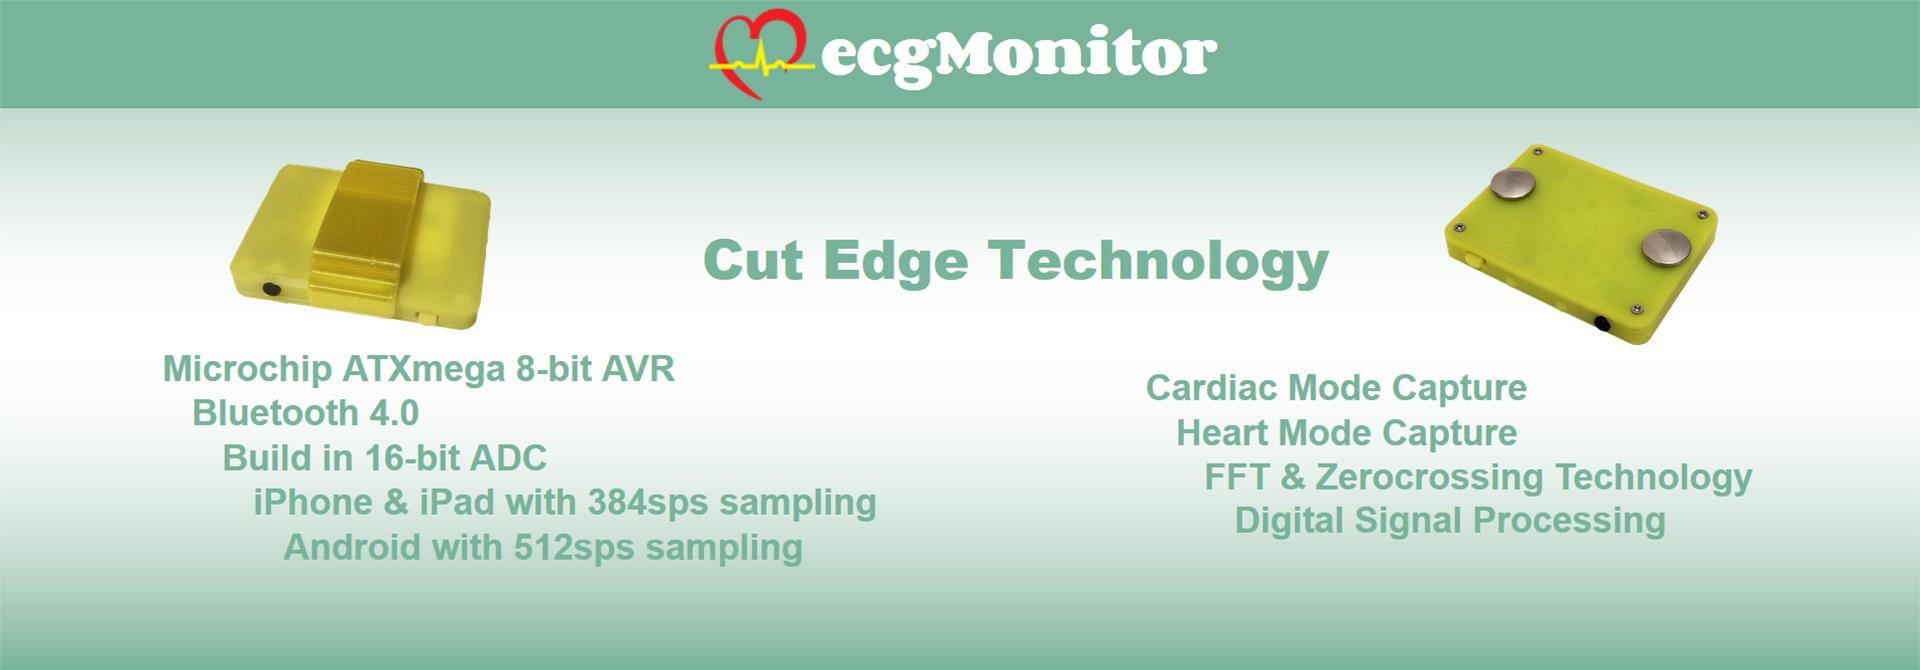 CutEdge-Technology